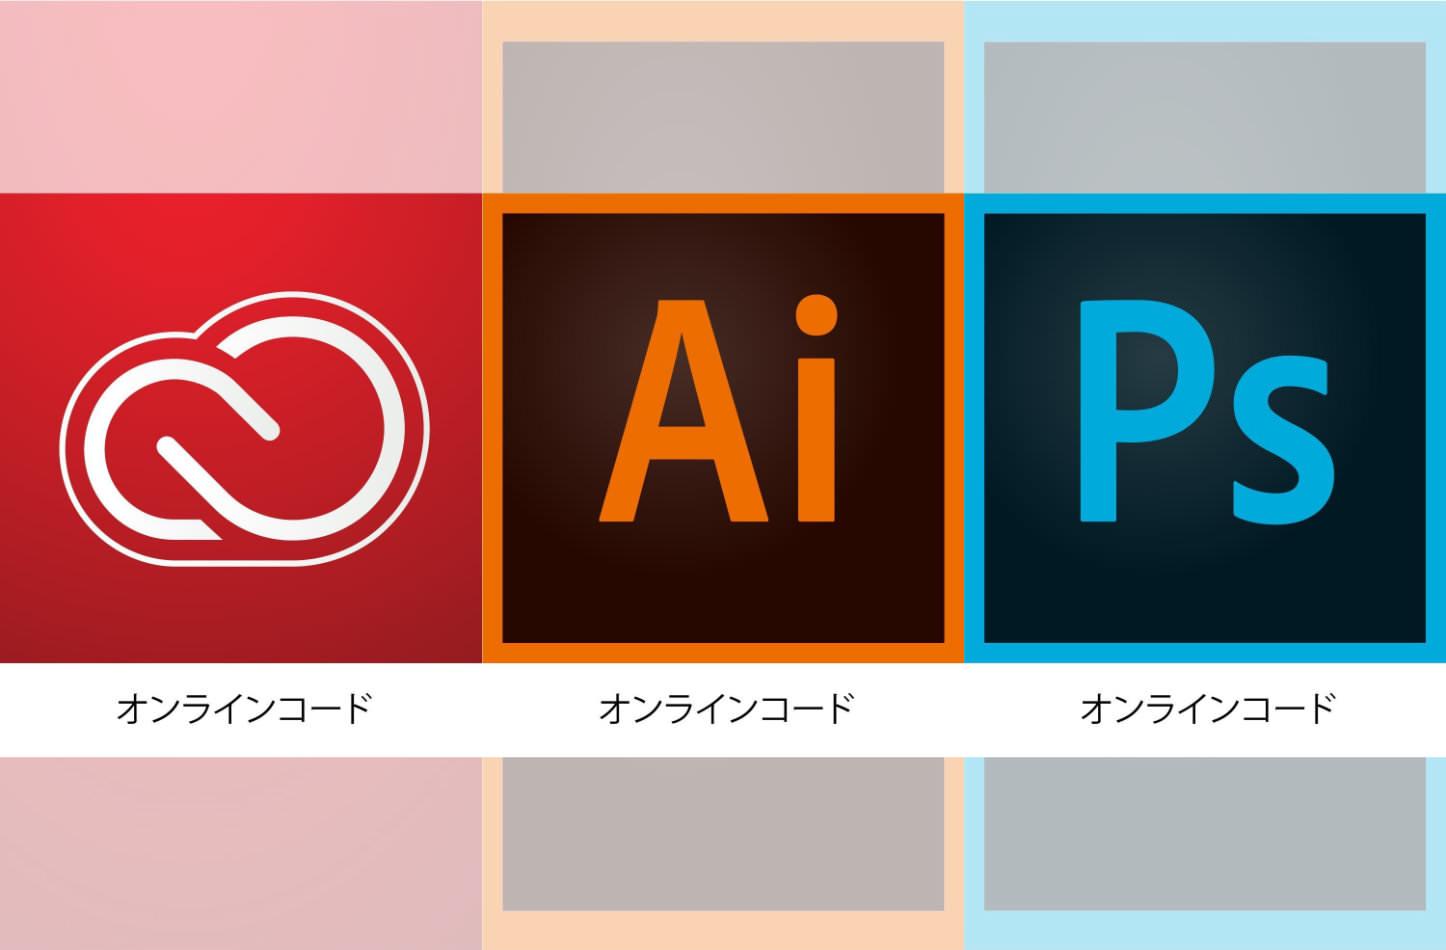 Adobe-Sale-20Percent-Off.jpg